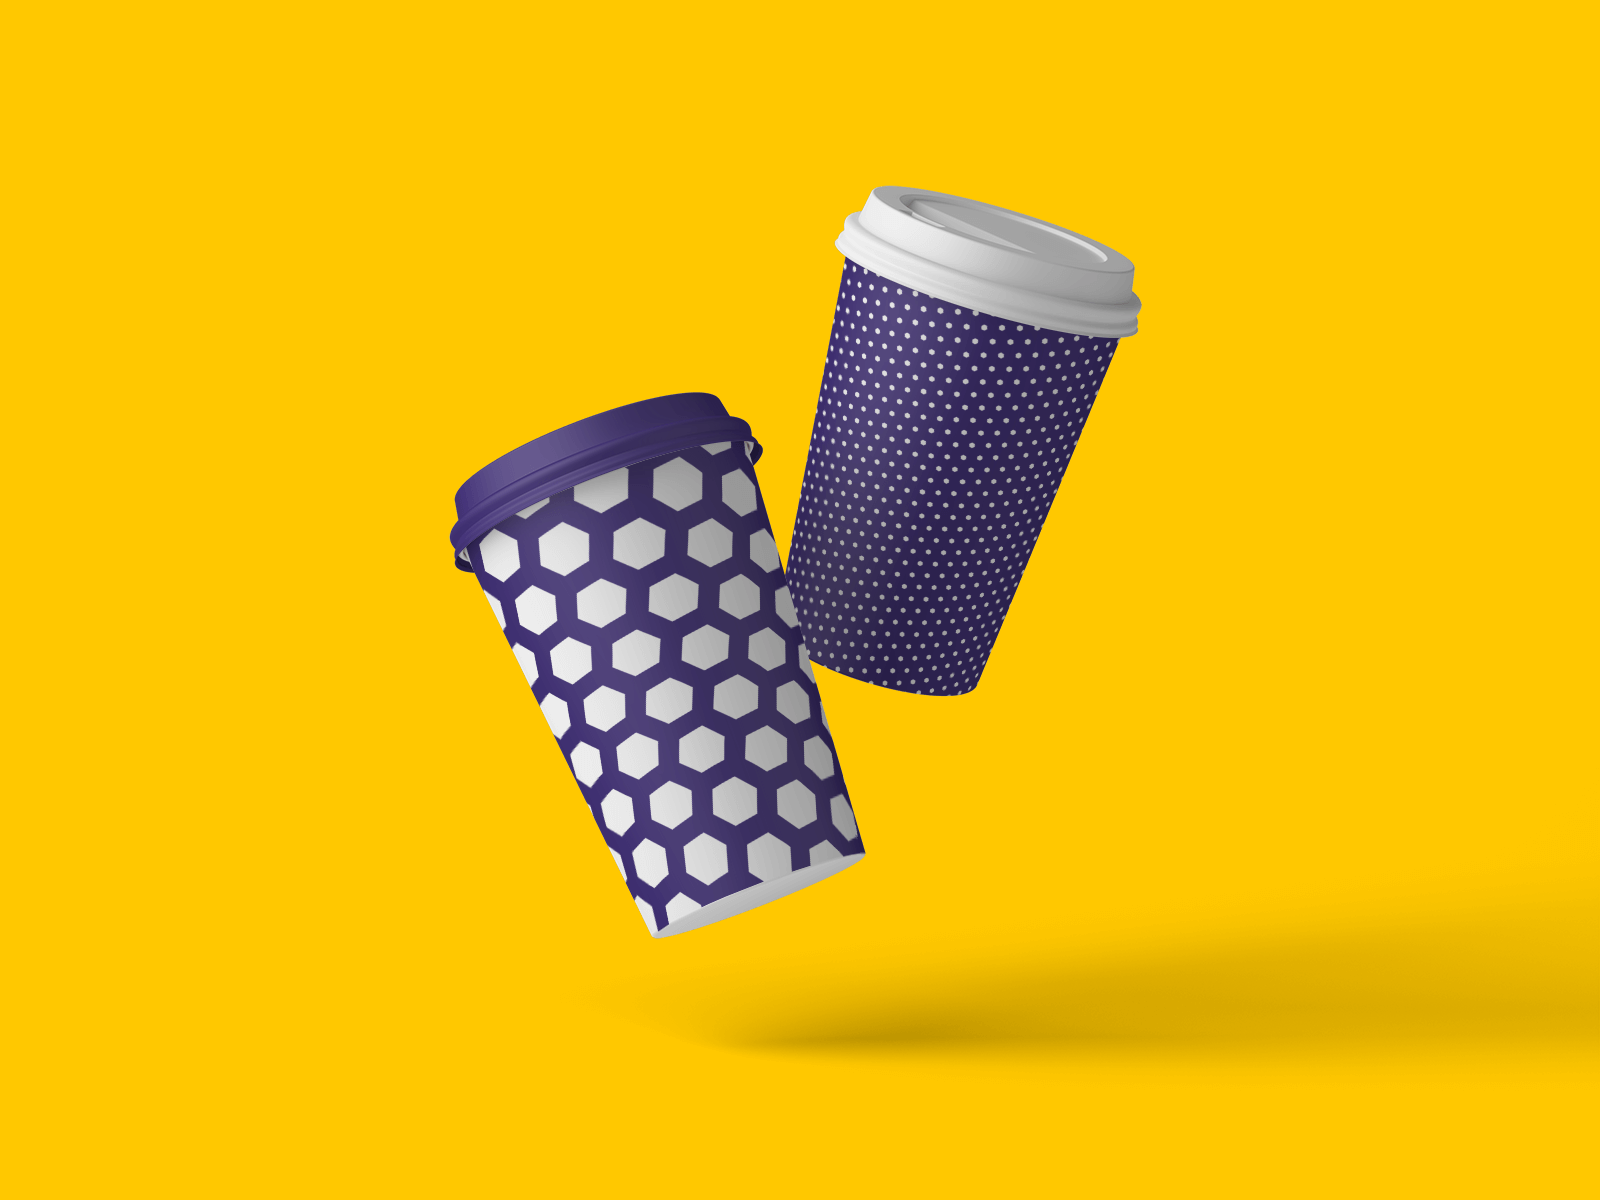 Mockup of Coffee Cup